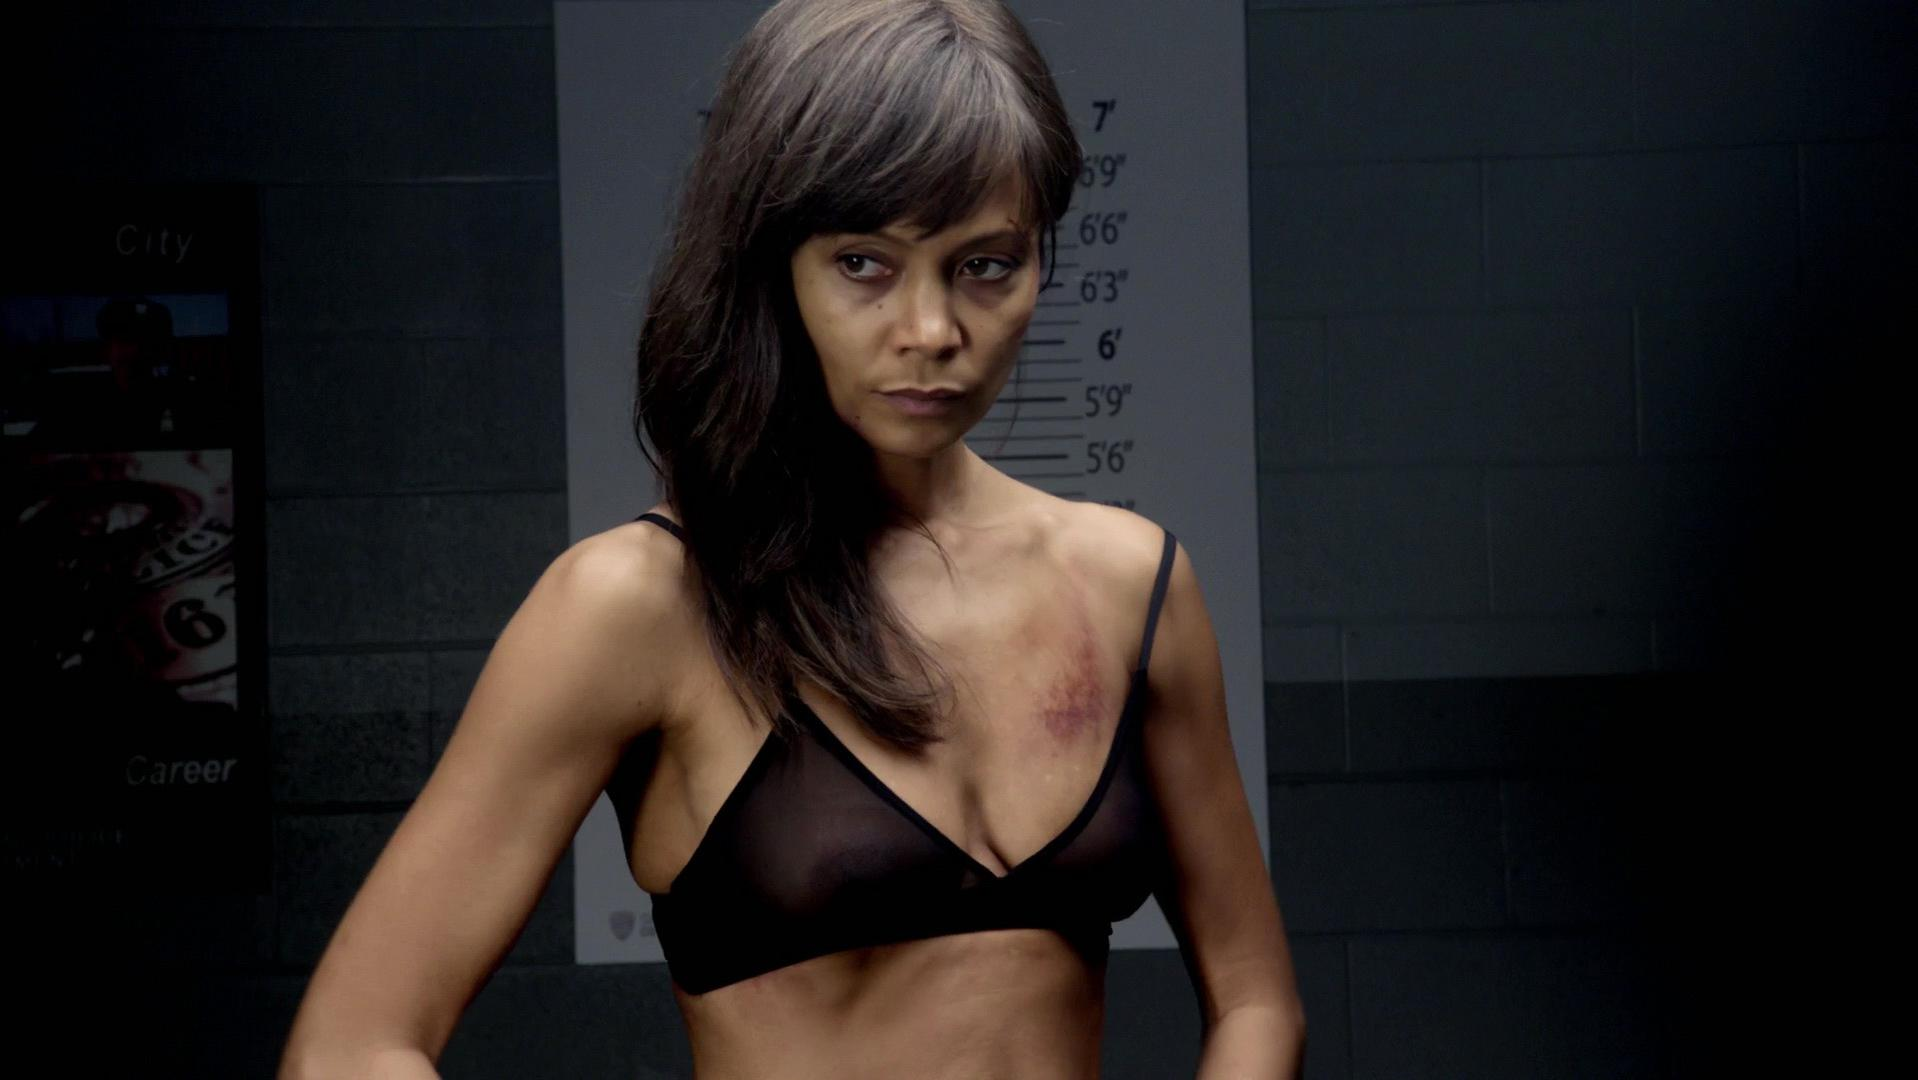 Thandie Newton nude - Rogue s01e08-10 (2013)